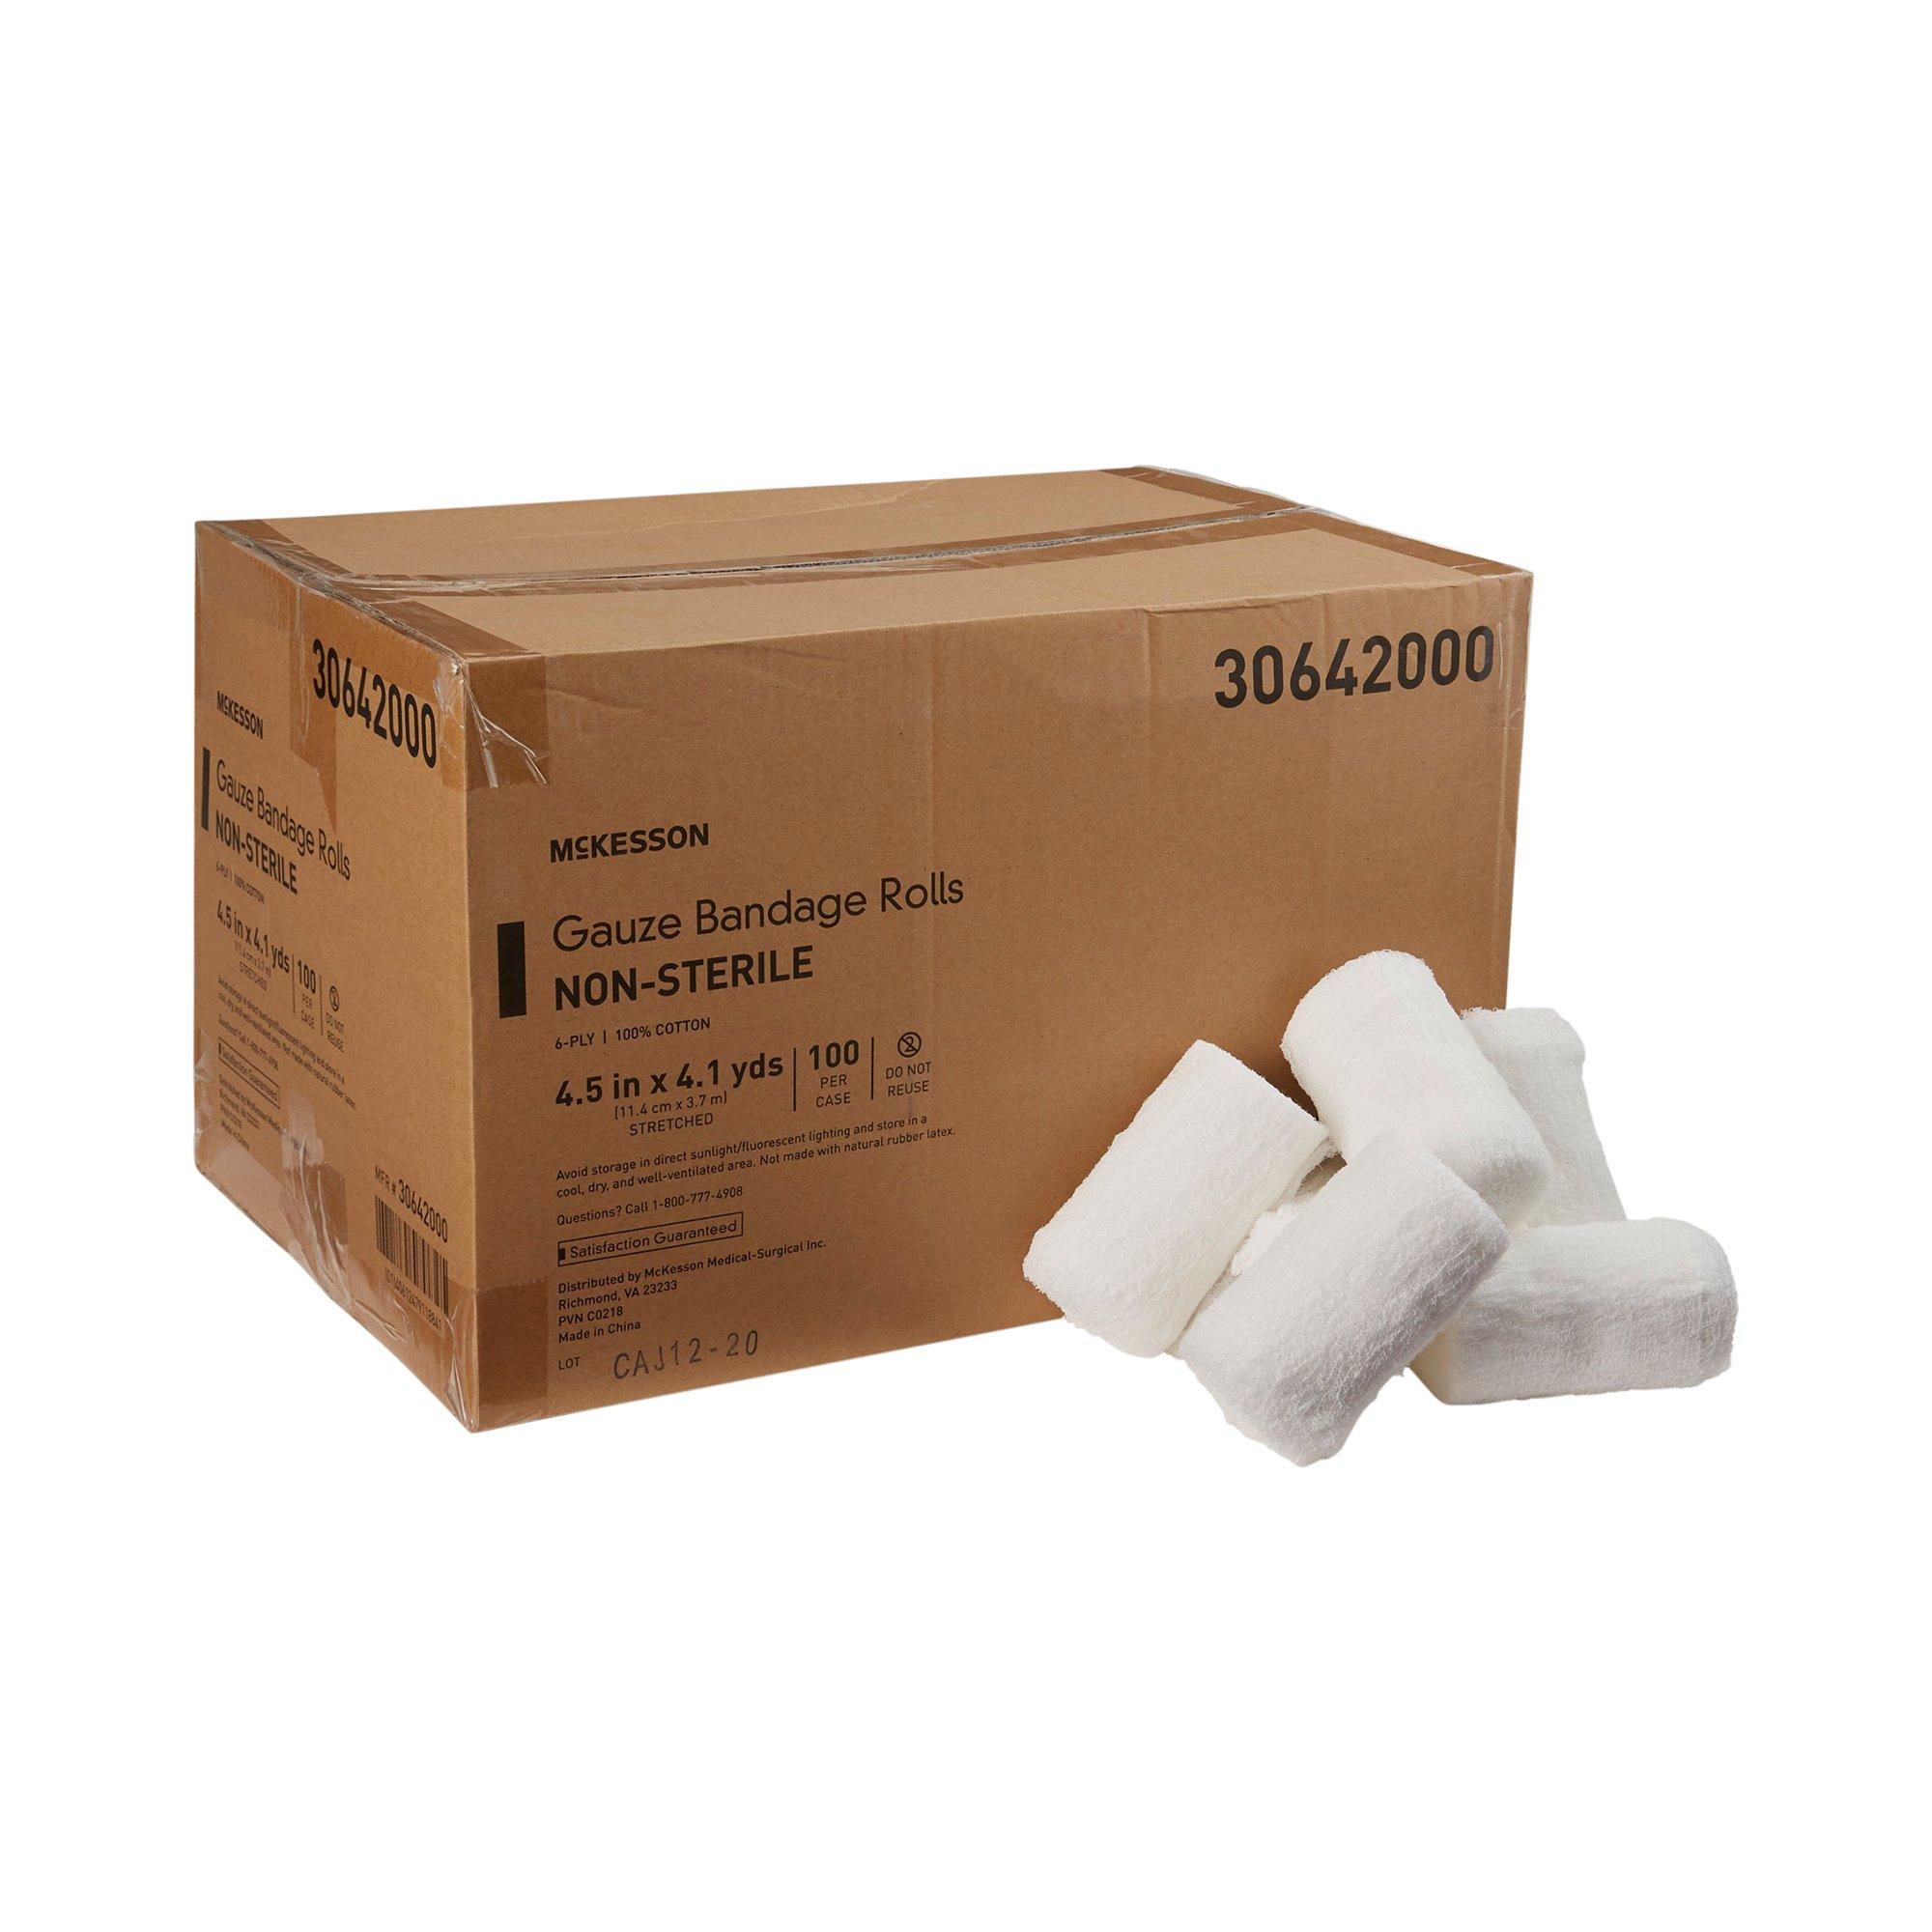 "McKesson Gauze Bandage Rolls,  4.5"" X 4-1/10 yd, 30642000, Case of 100"